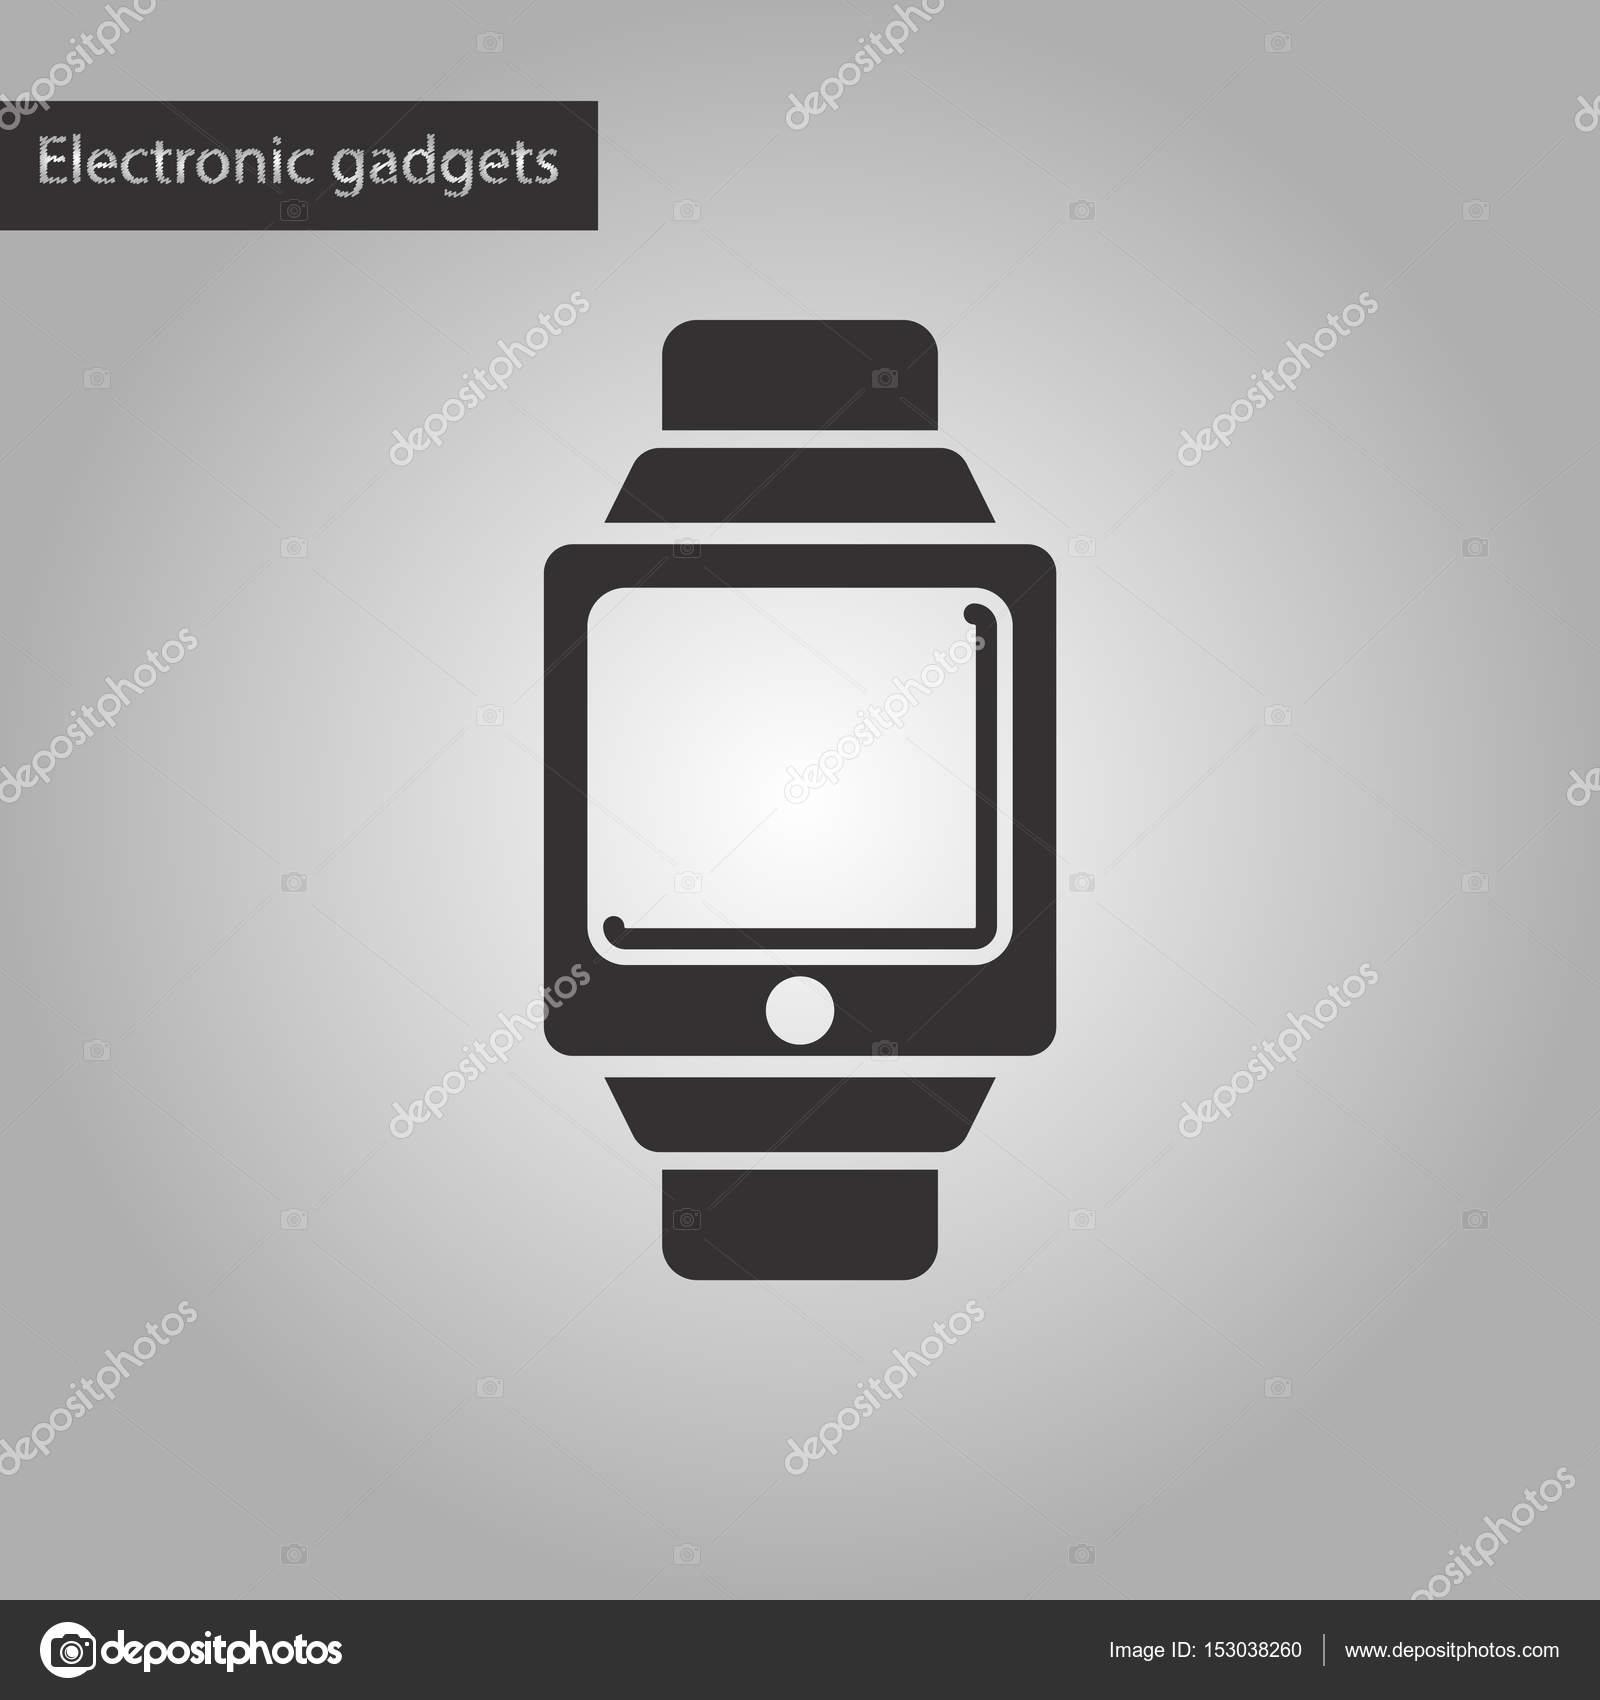 černá a bílá stylu ikona digitální hodinky — Stock Vektor ... 0c0a31e4cc